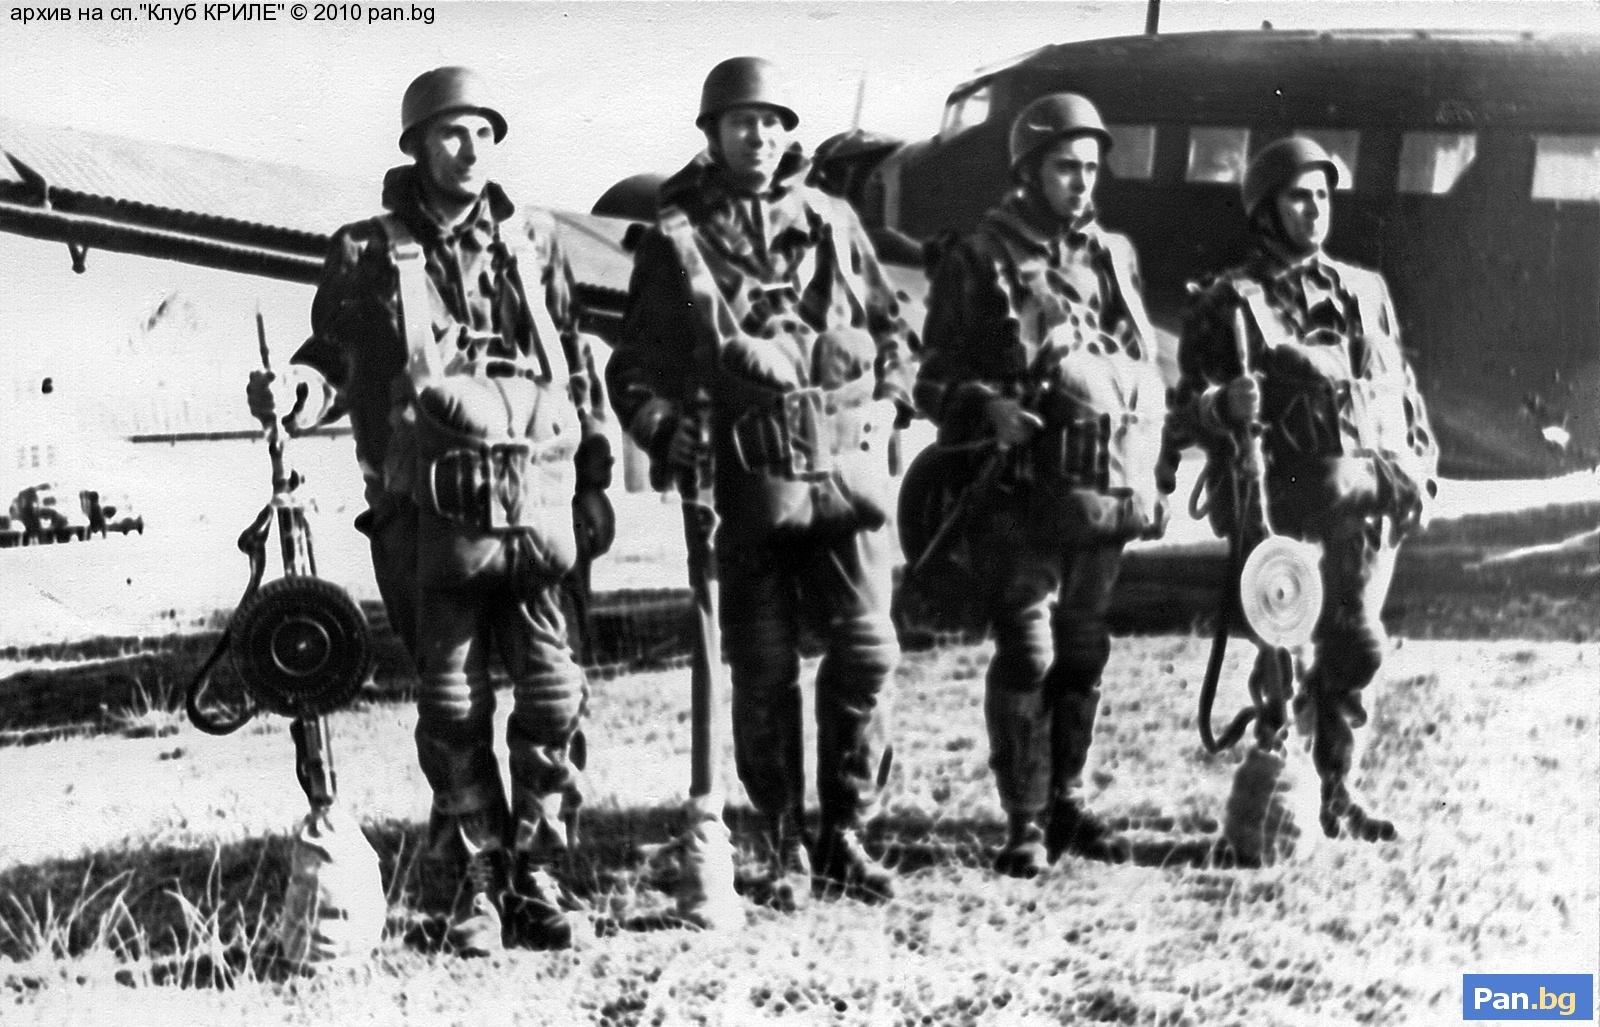 Bulgarian Special Forces/Airborne Splinter Uniform 663